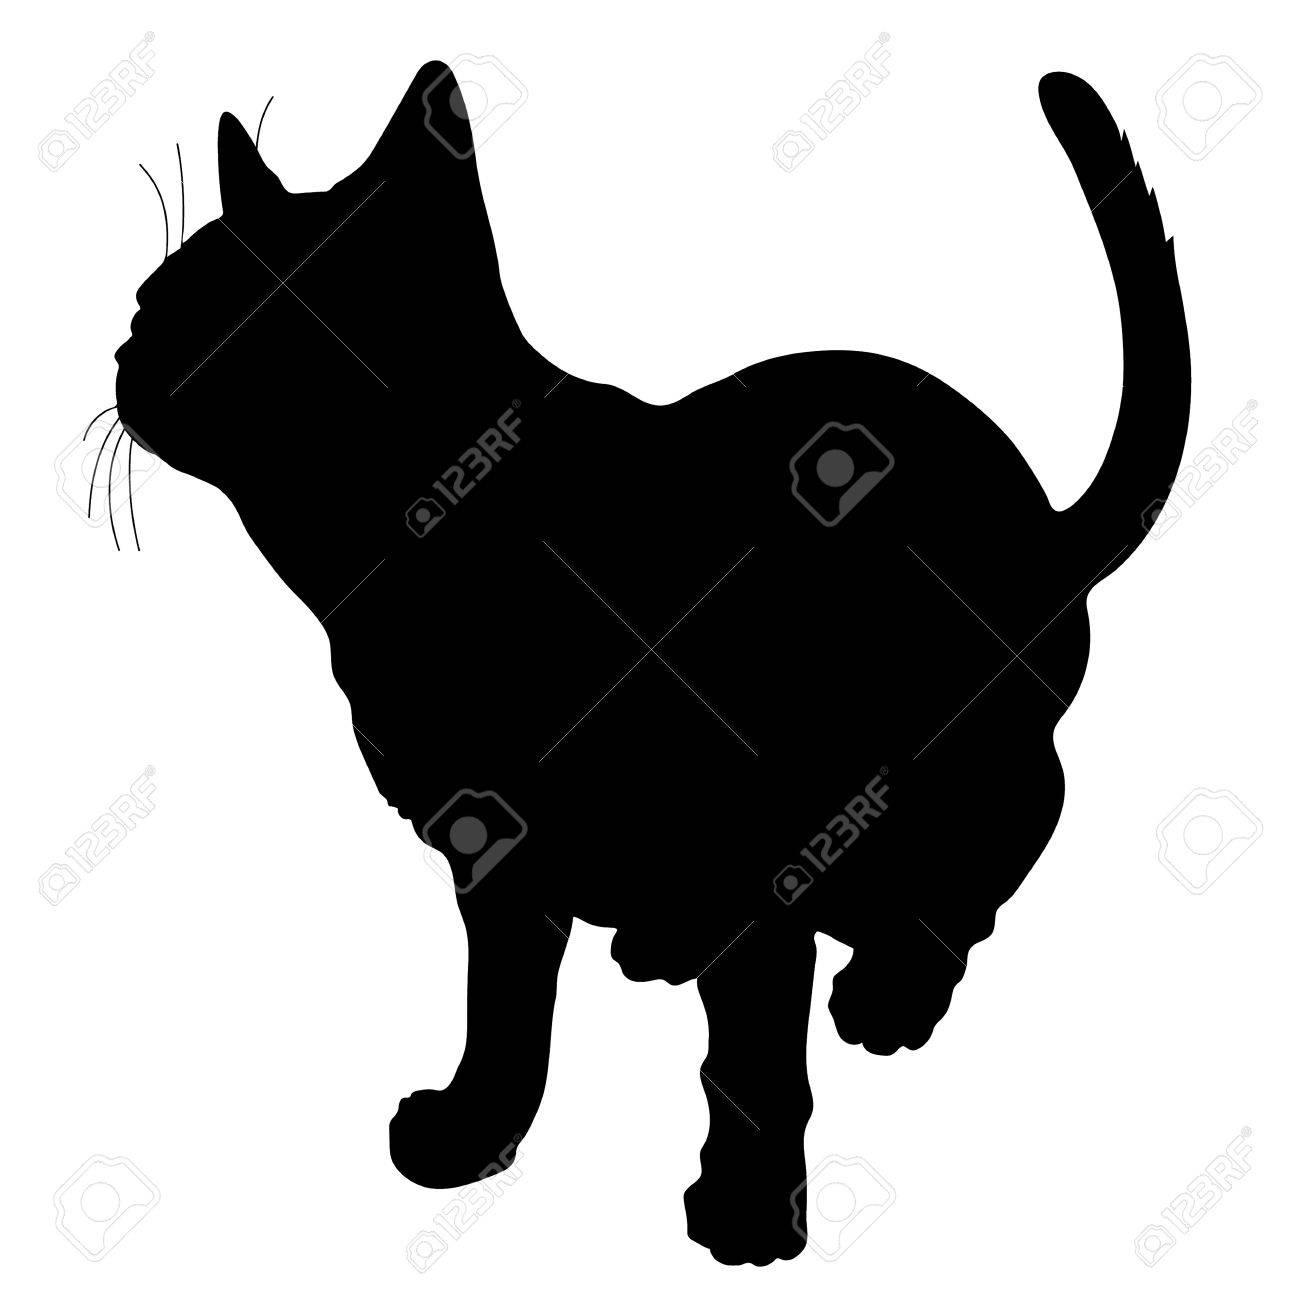 A black silhouette of a cat - 41855413